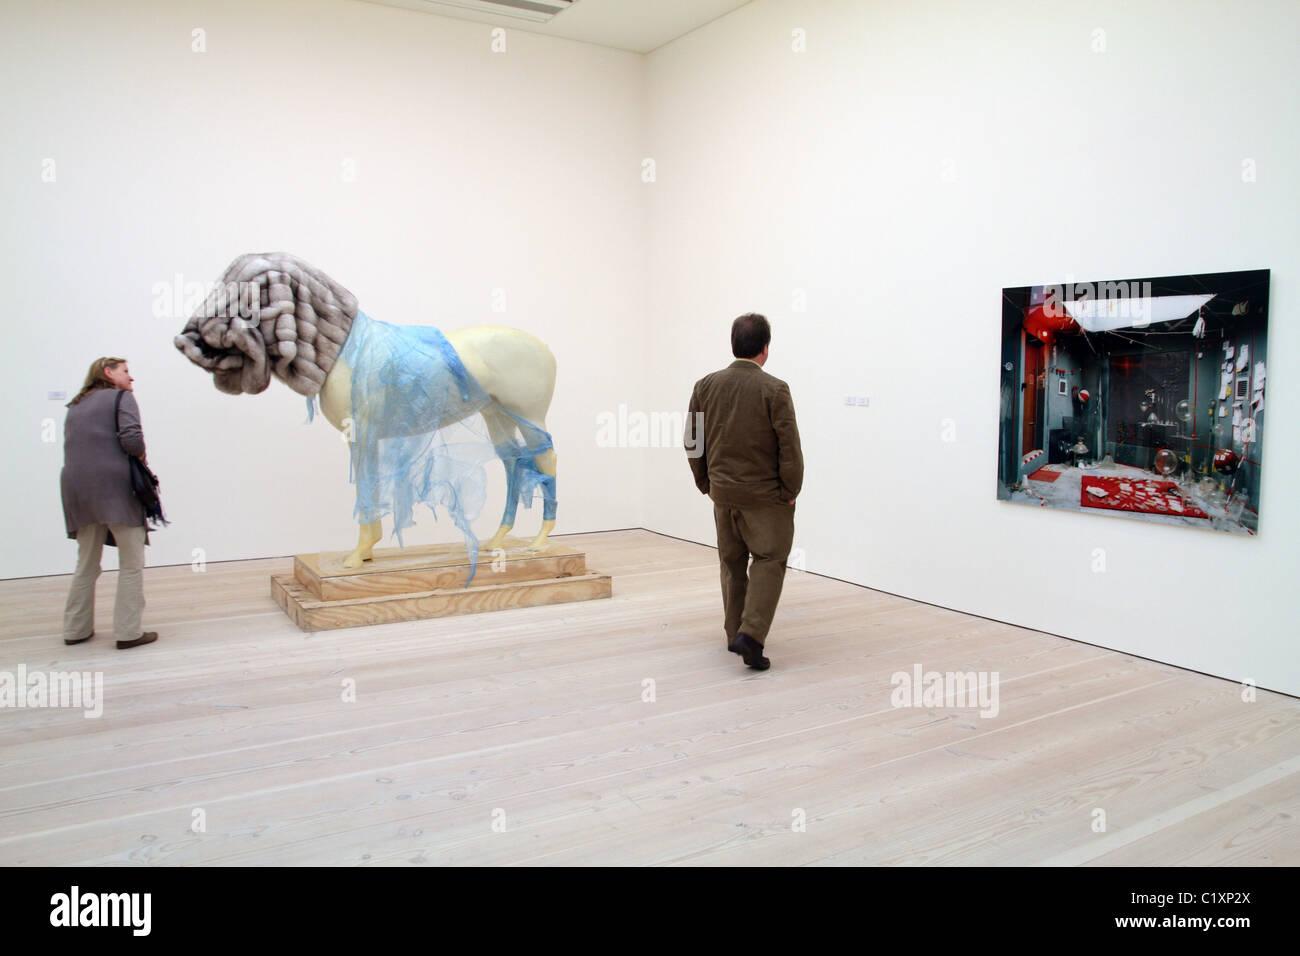 Uk Visitors To Saatchi Art Gallery In Chelsea London Stock Photo Alamy